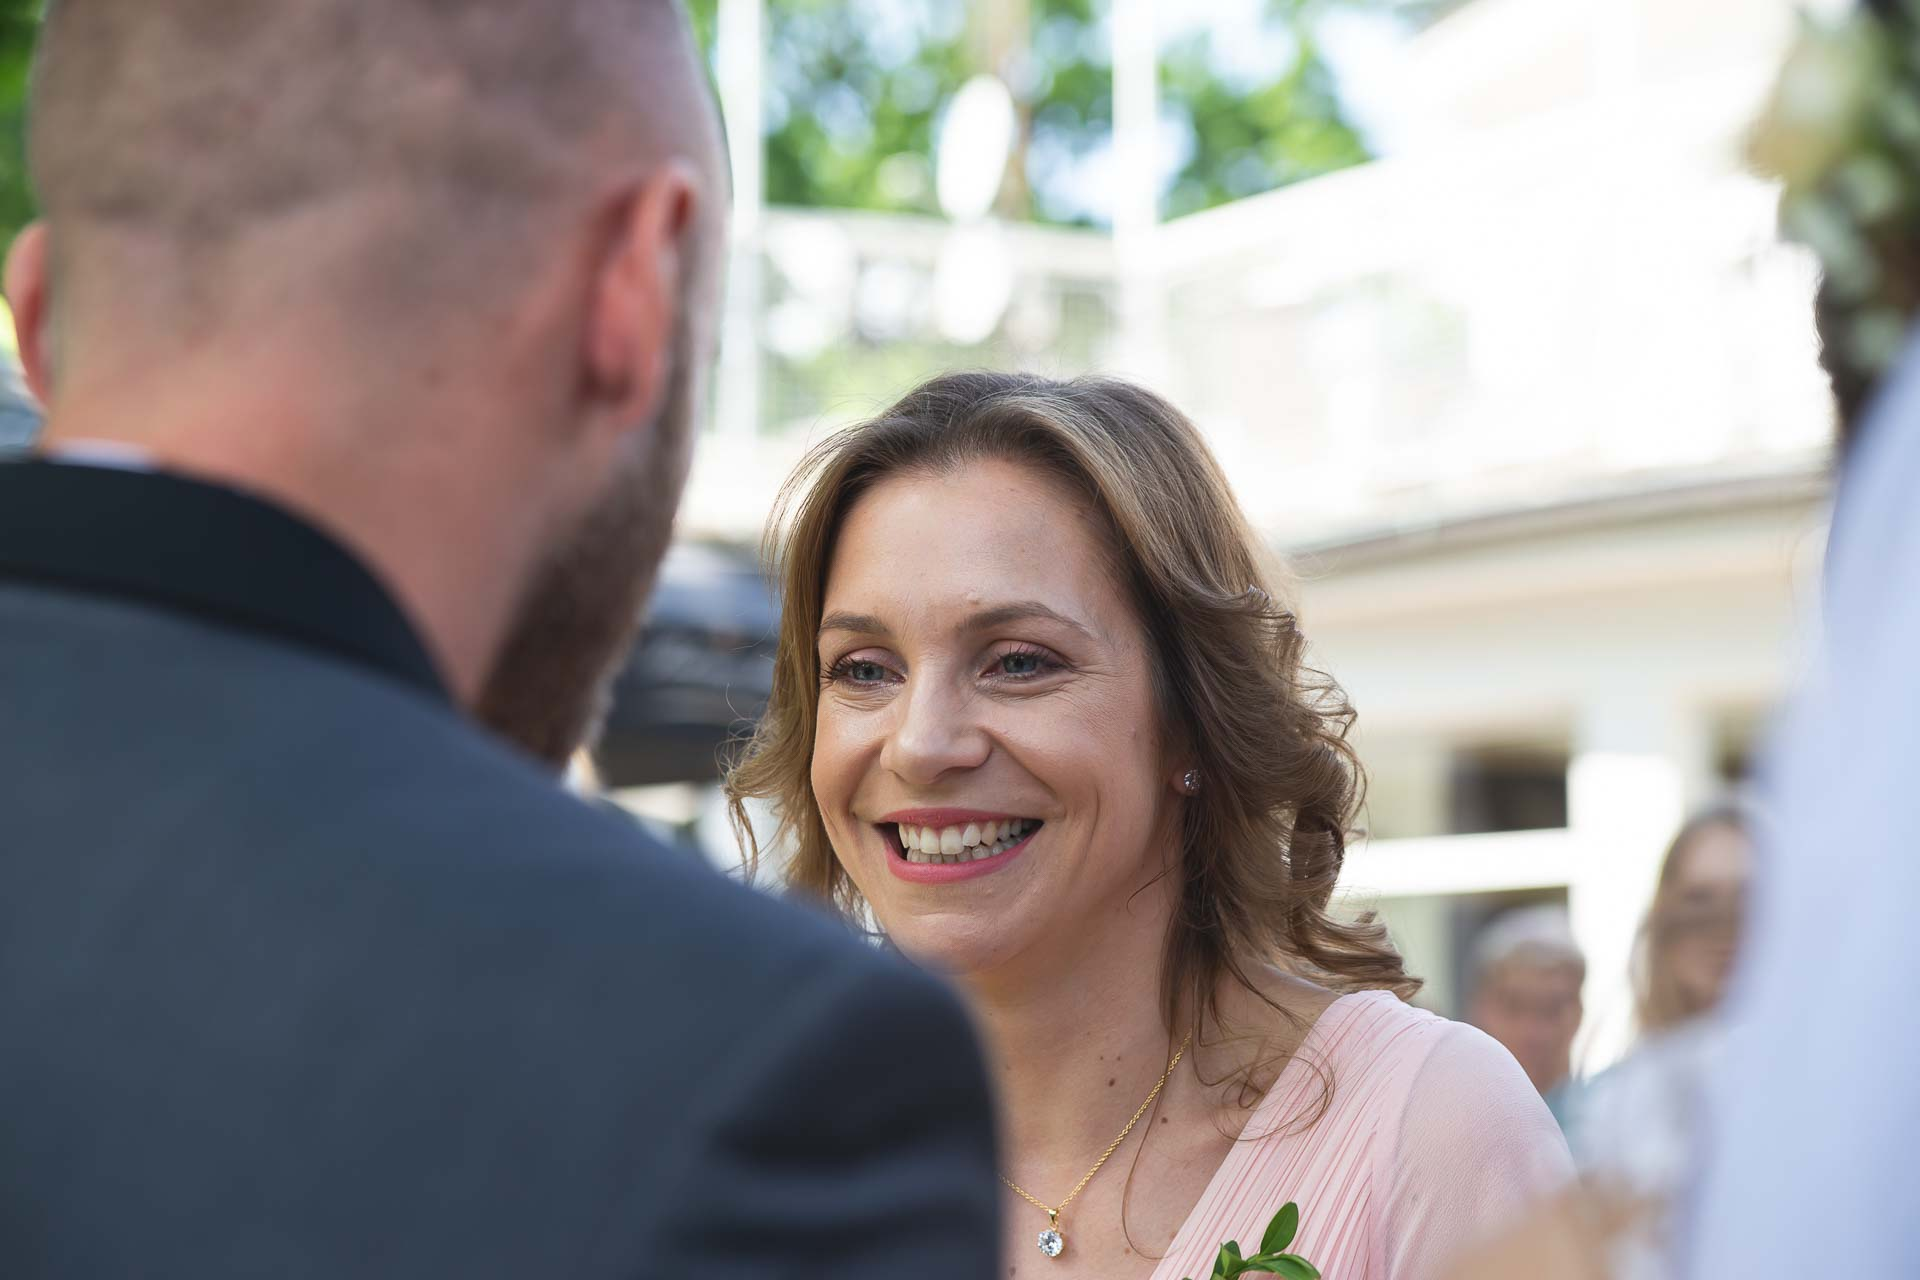 svatební-fotograf-svatebni-video-Nymburk-hotel-Ostrov-Beautyfoto-5274